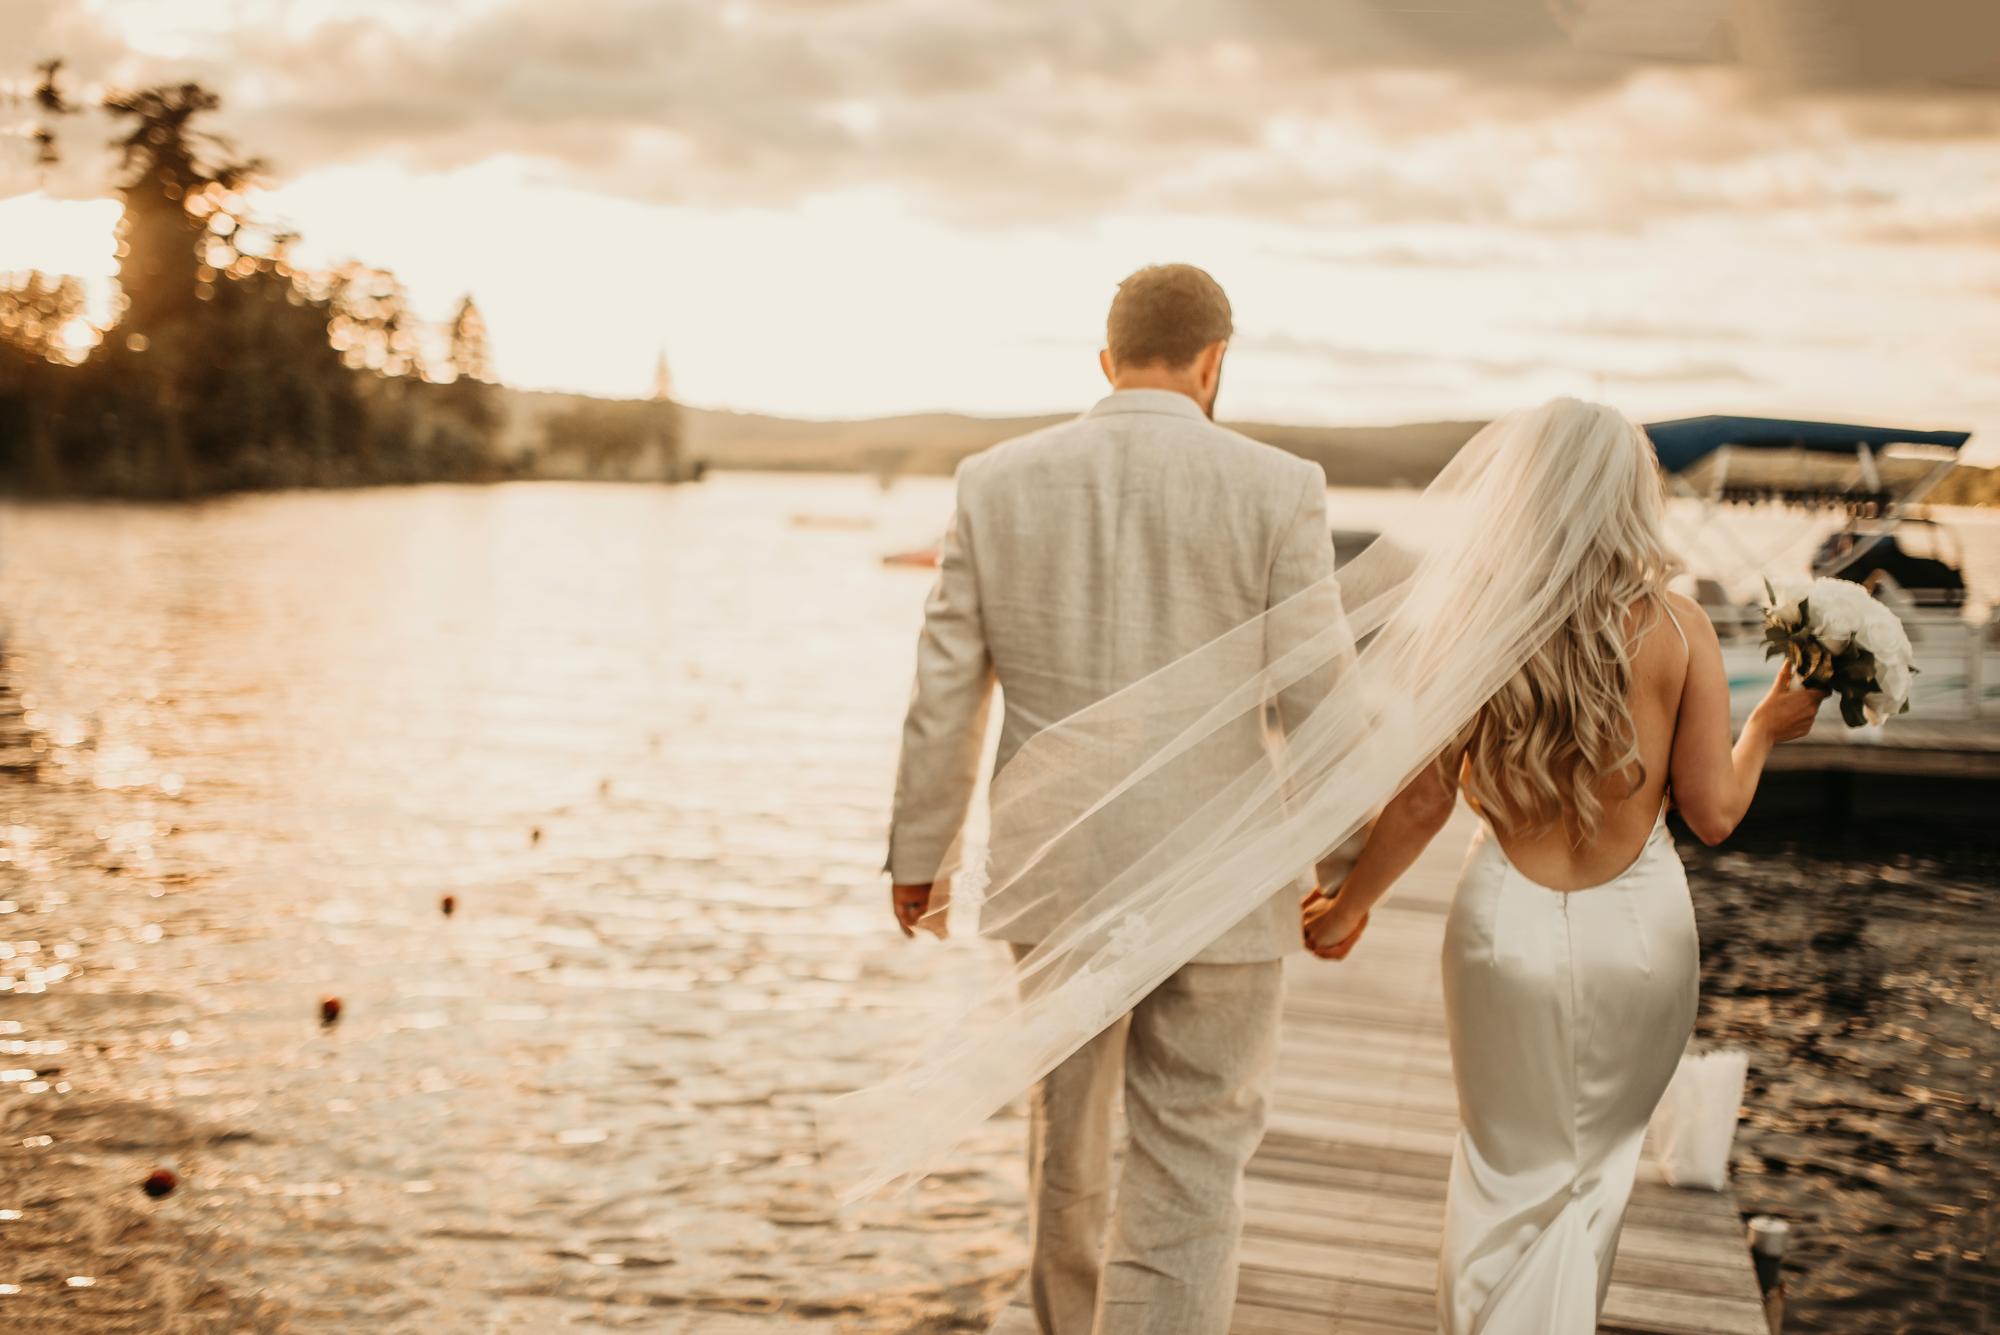 New England Based Award-Winning Wedding and Elopements Photographer | Golden Aura Photography